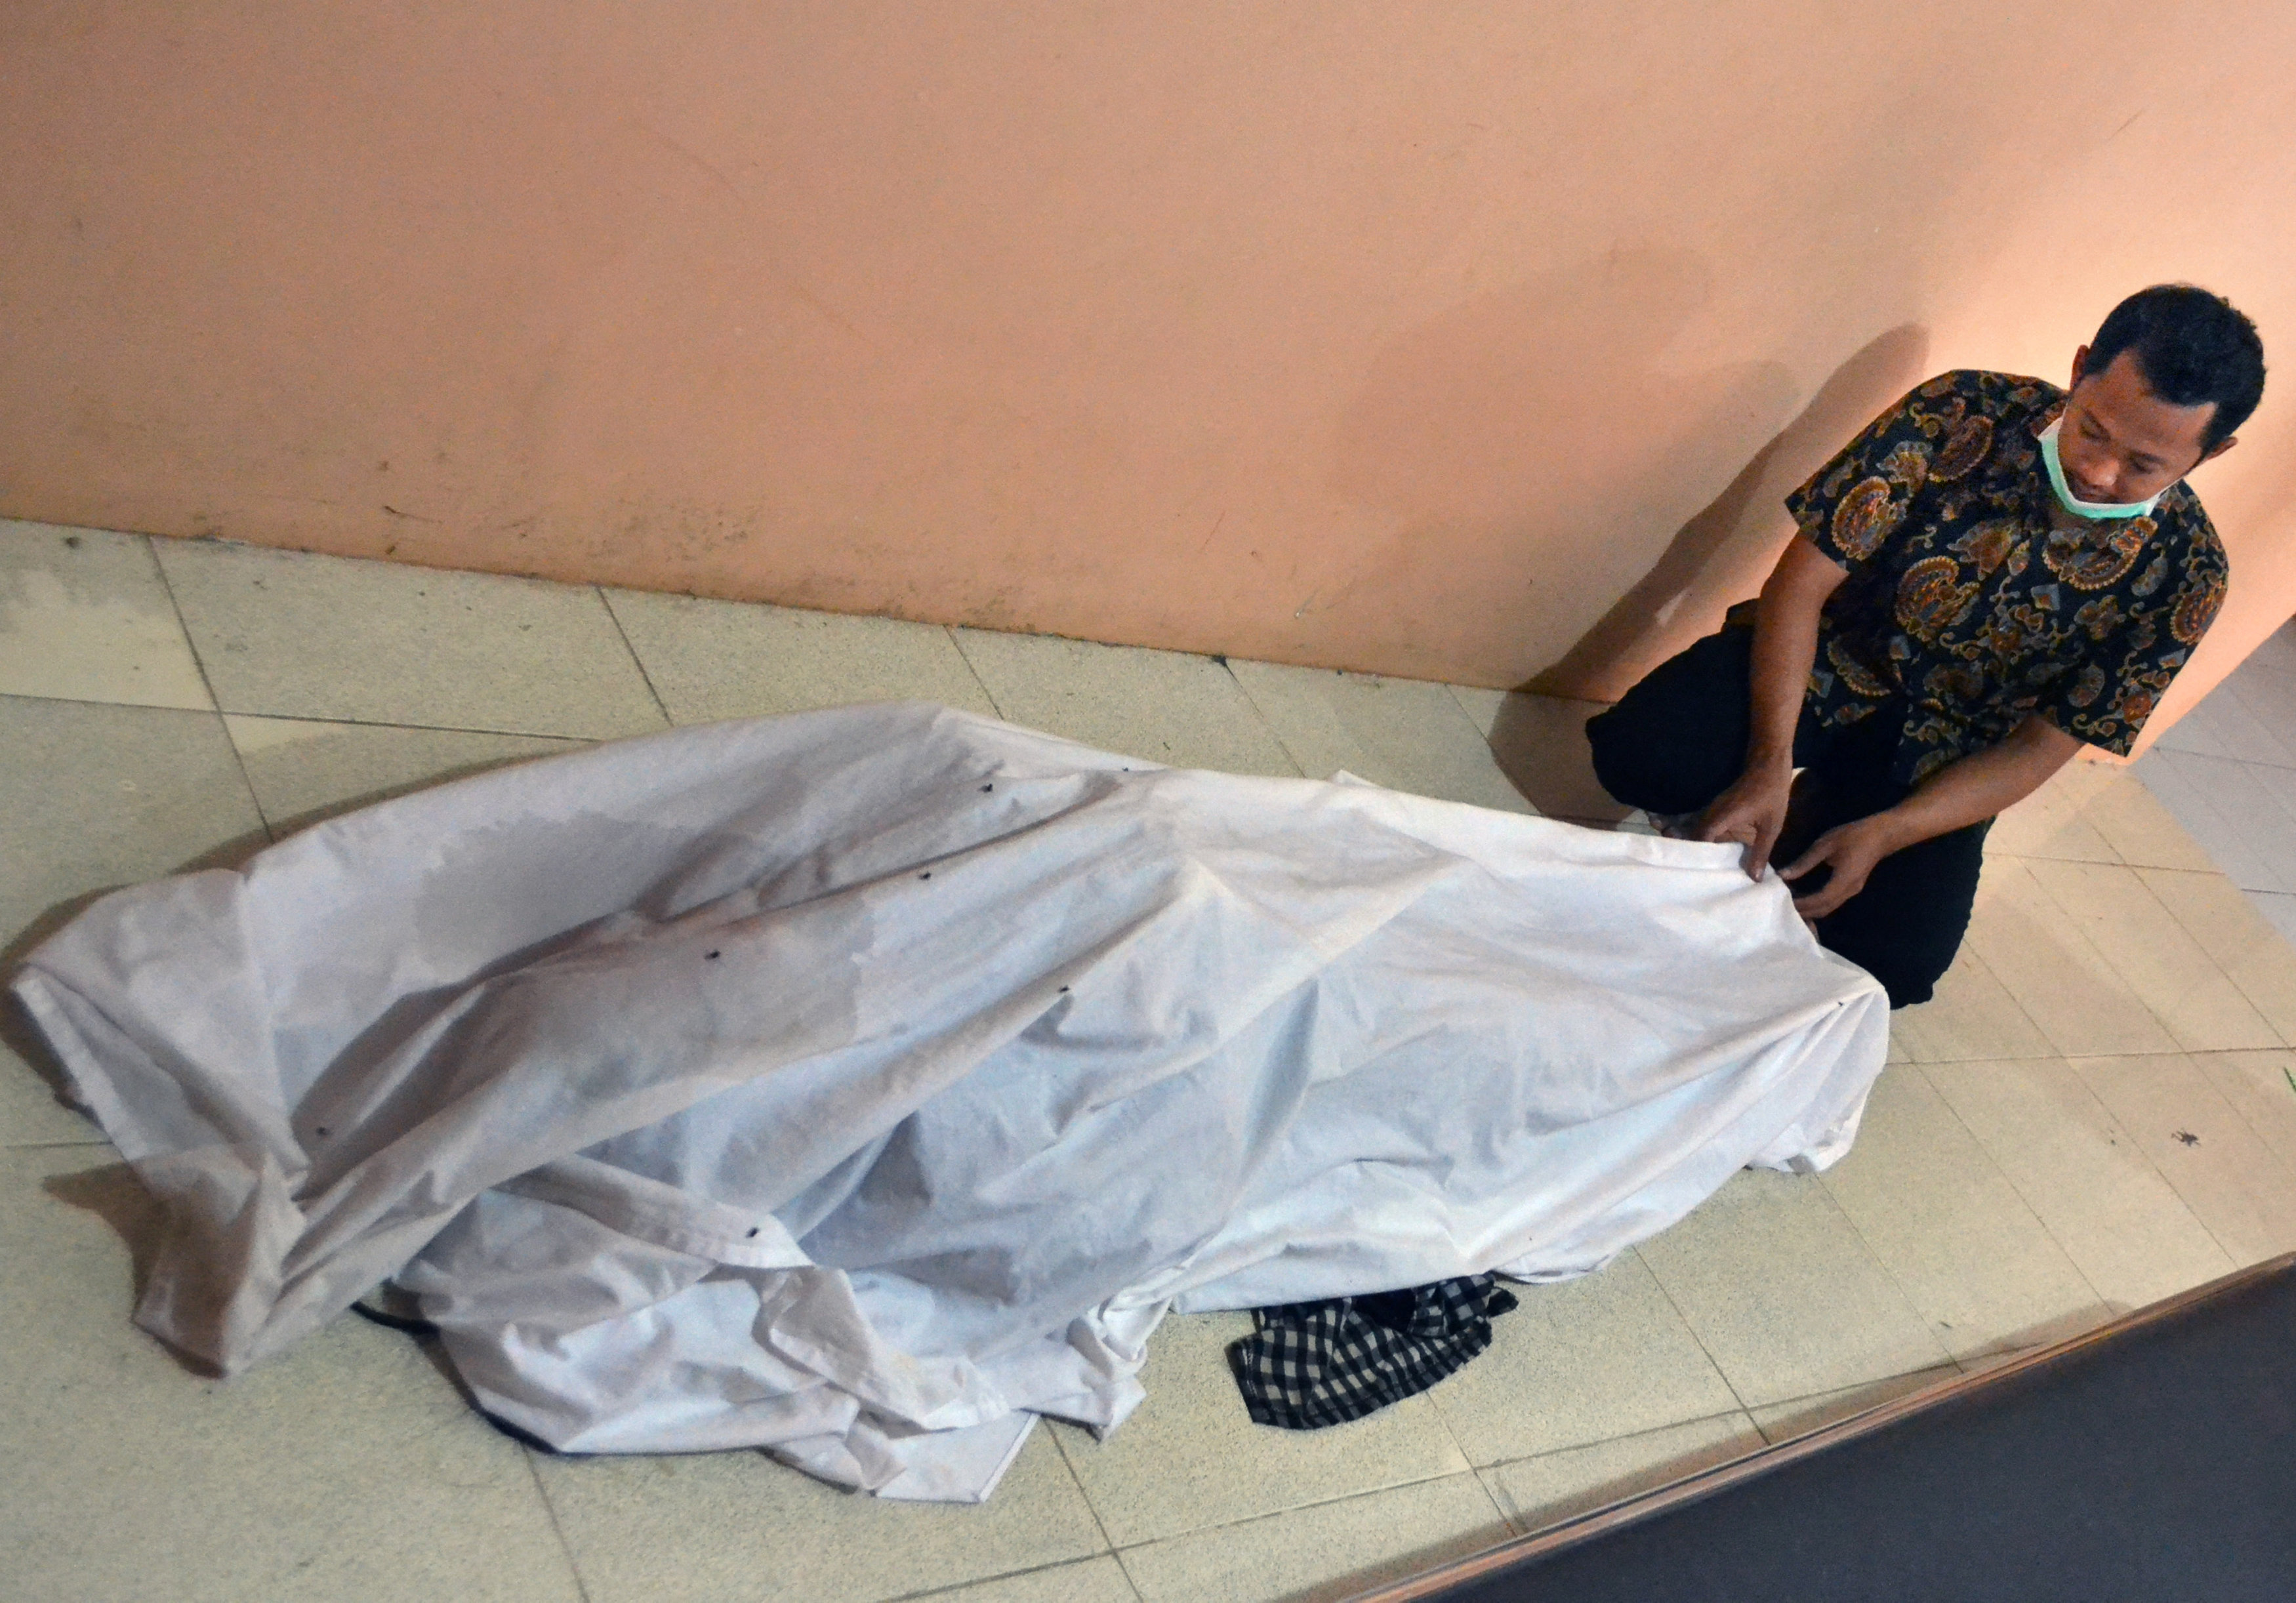 Un hombre cubre el cuerpo de una víctima. (Antara Foto/Muhammad Bagus Khoirunas/ via REUTERs)